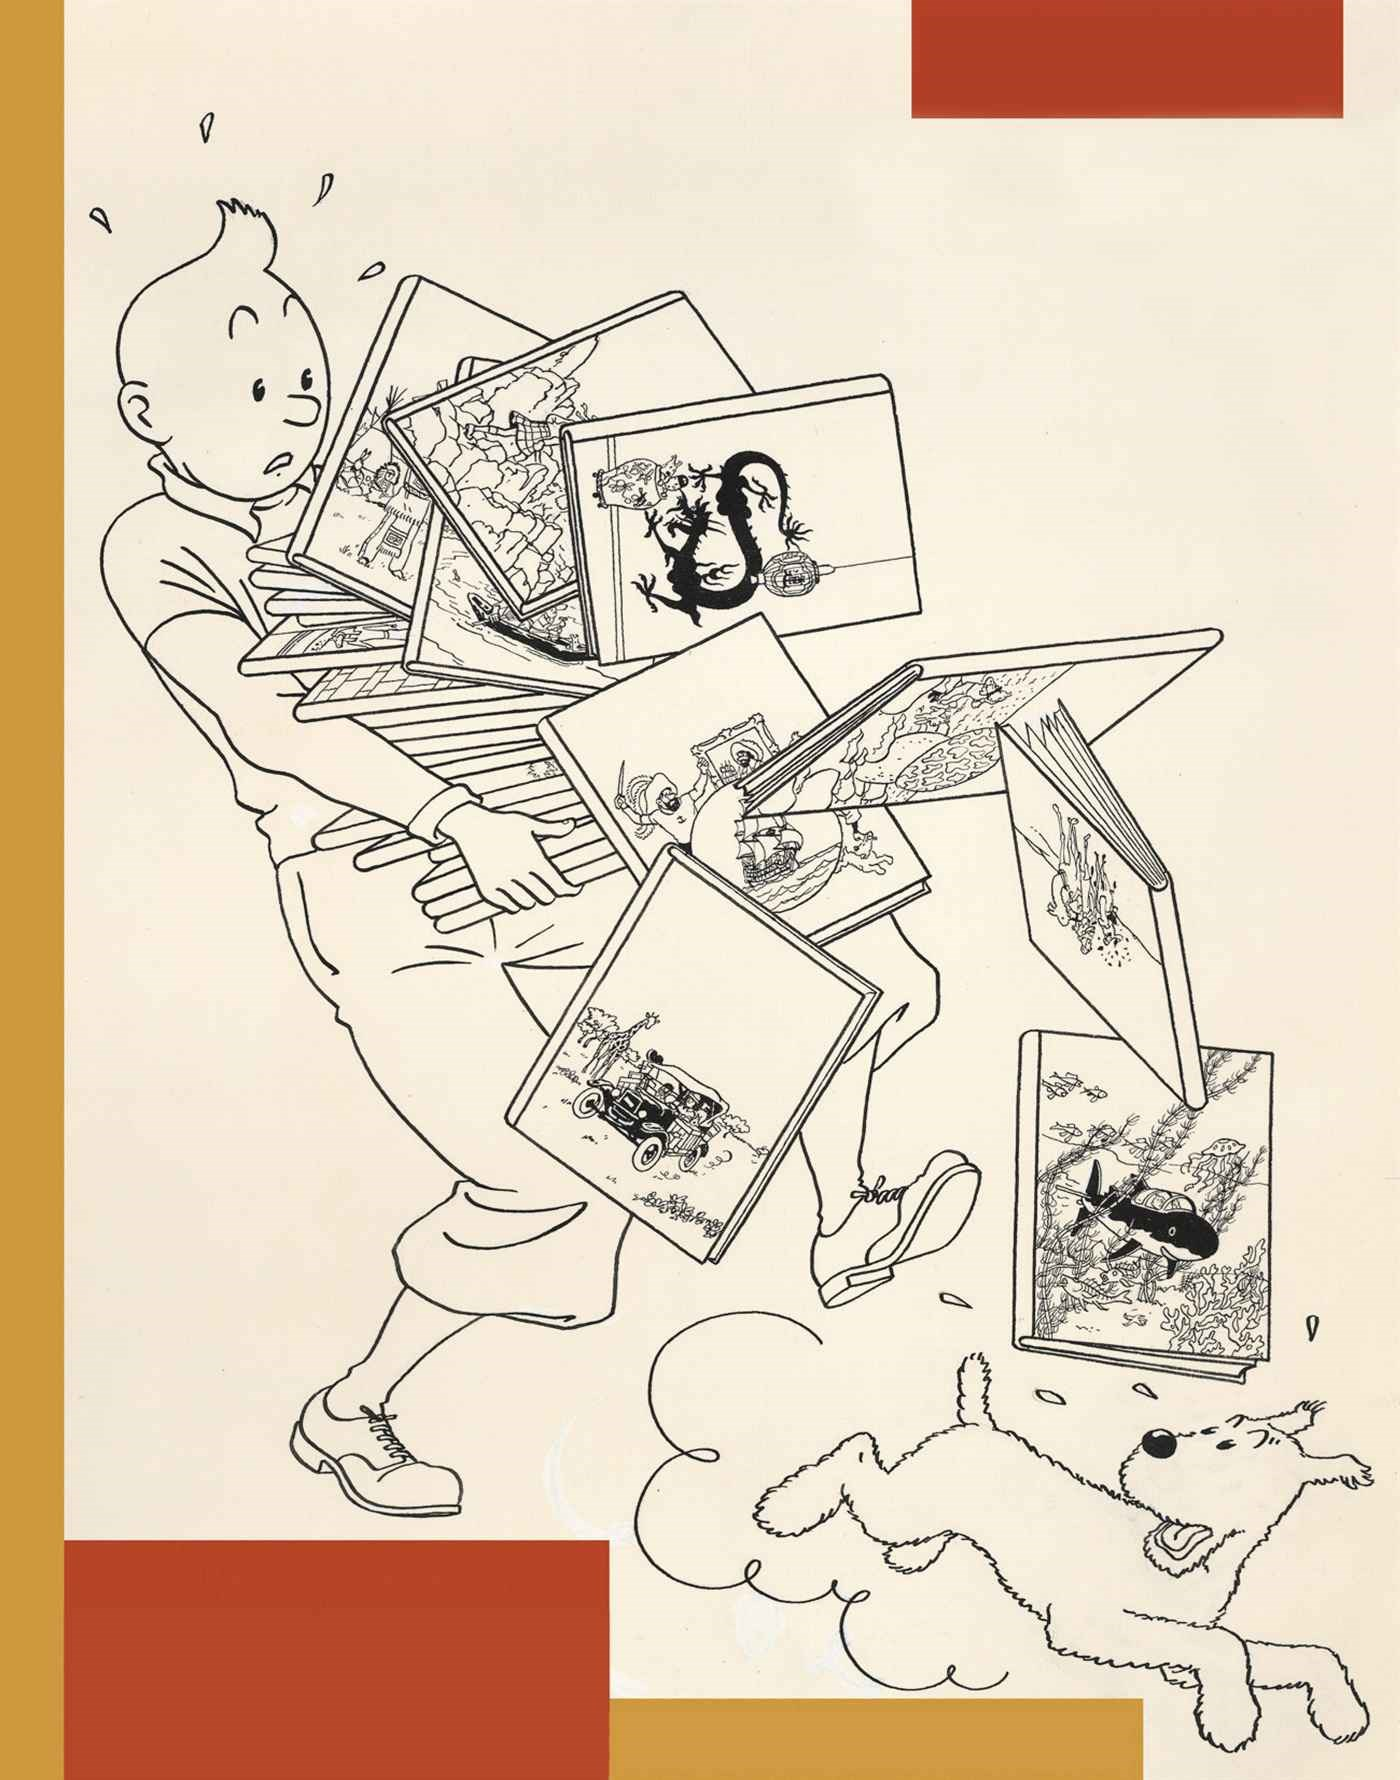 Tintin auction at Christies